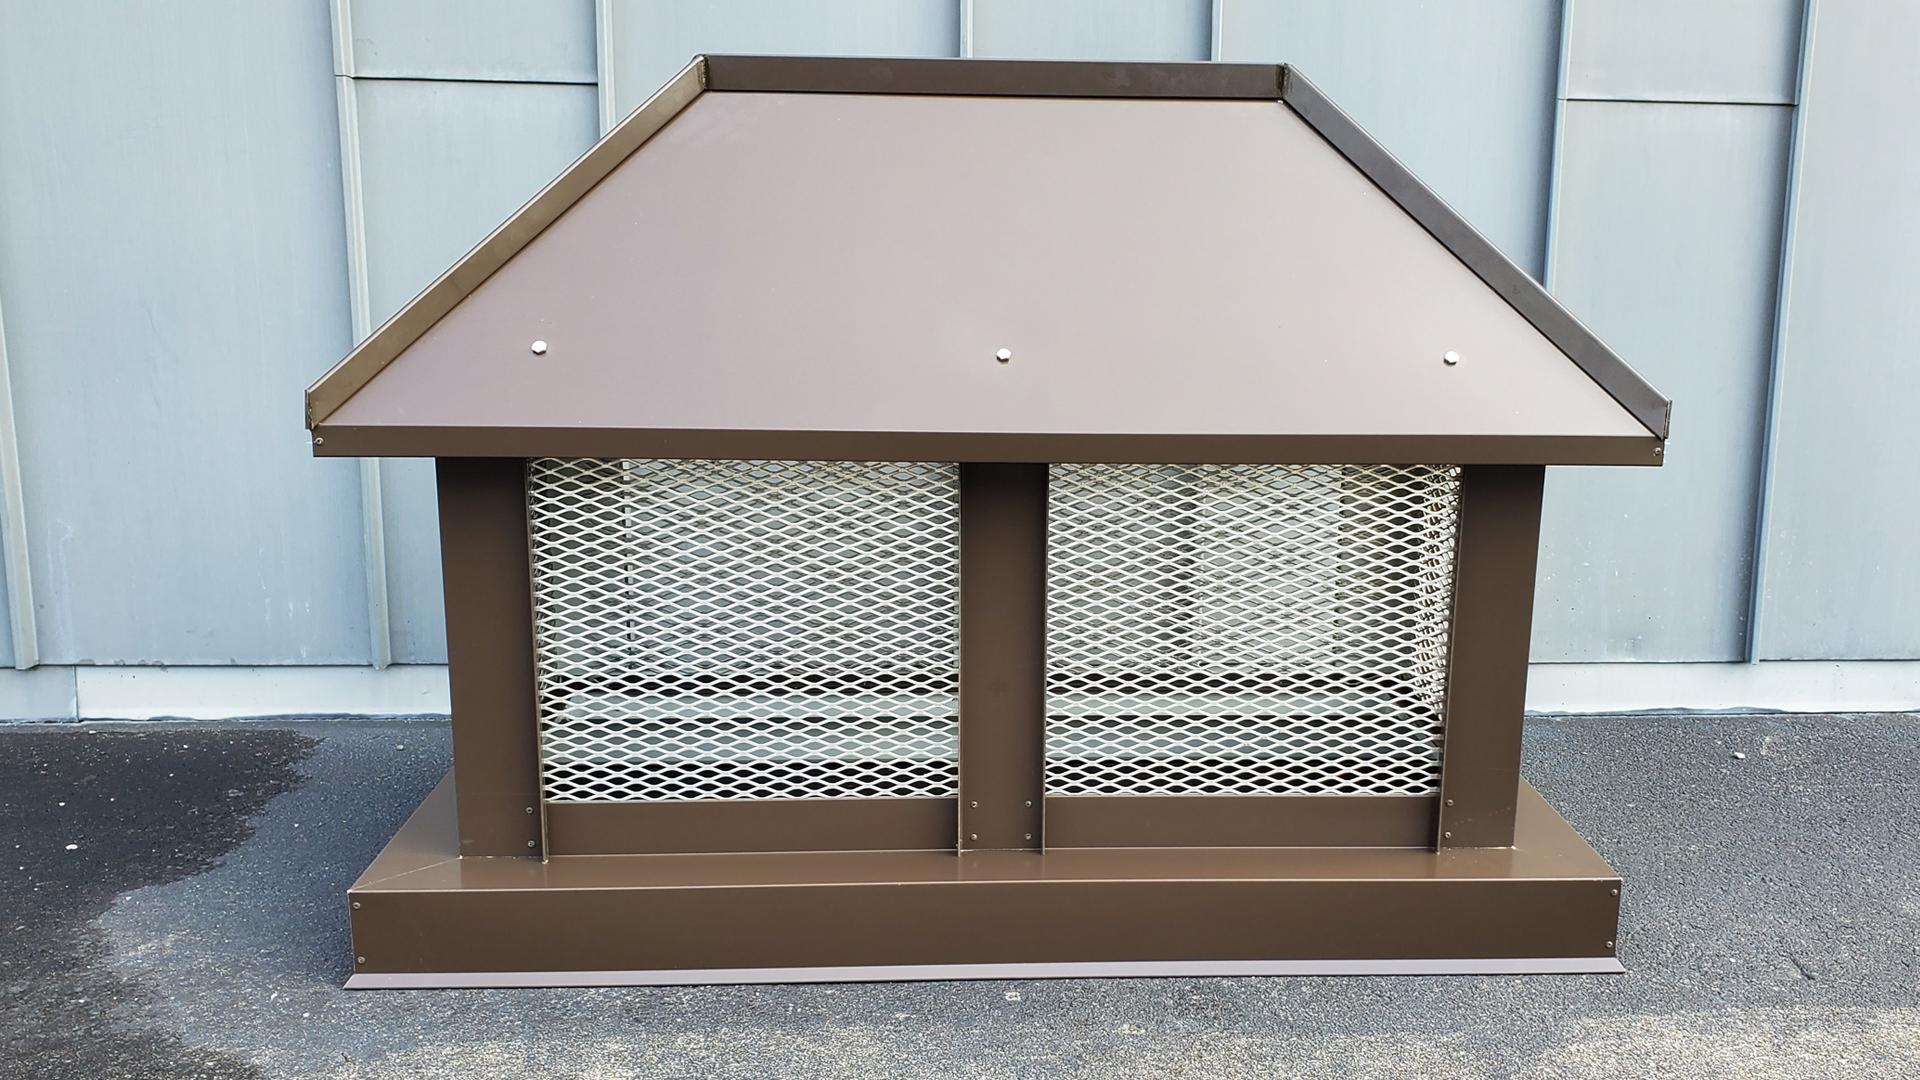 CC103 - Dark bronze steel standing seam custom chimney cap